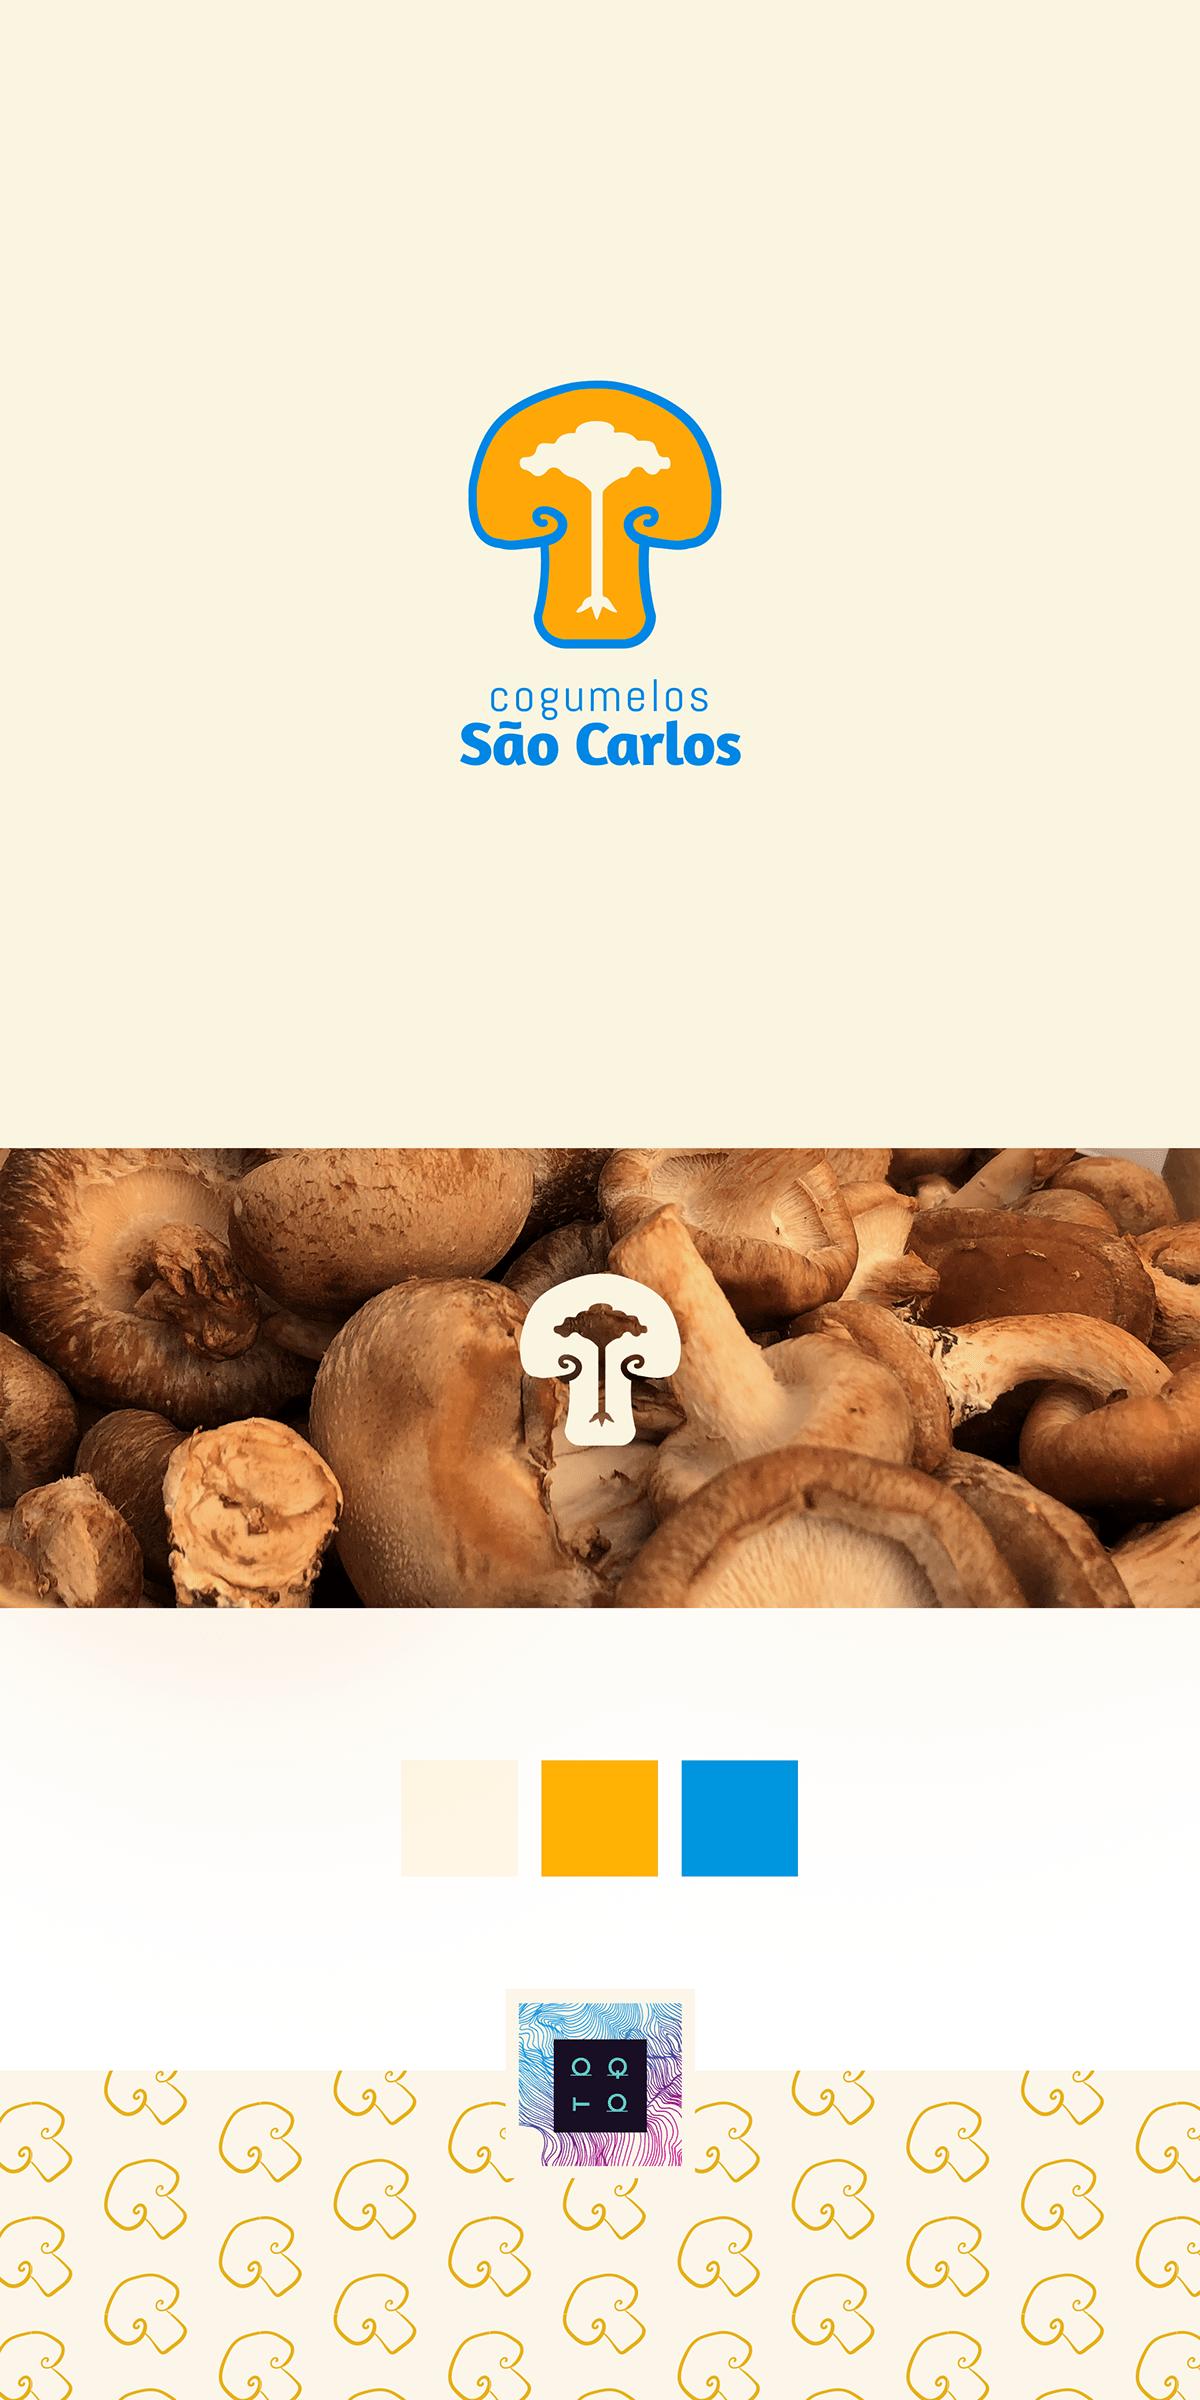 brand branding  cogumelo design Food  ID identidade visual logo mushroom Packaging